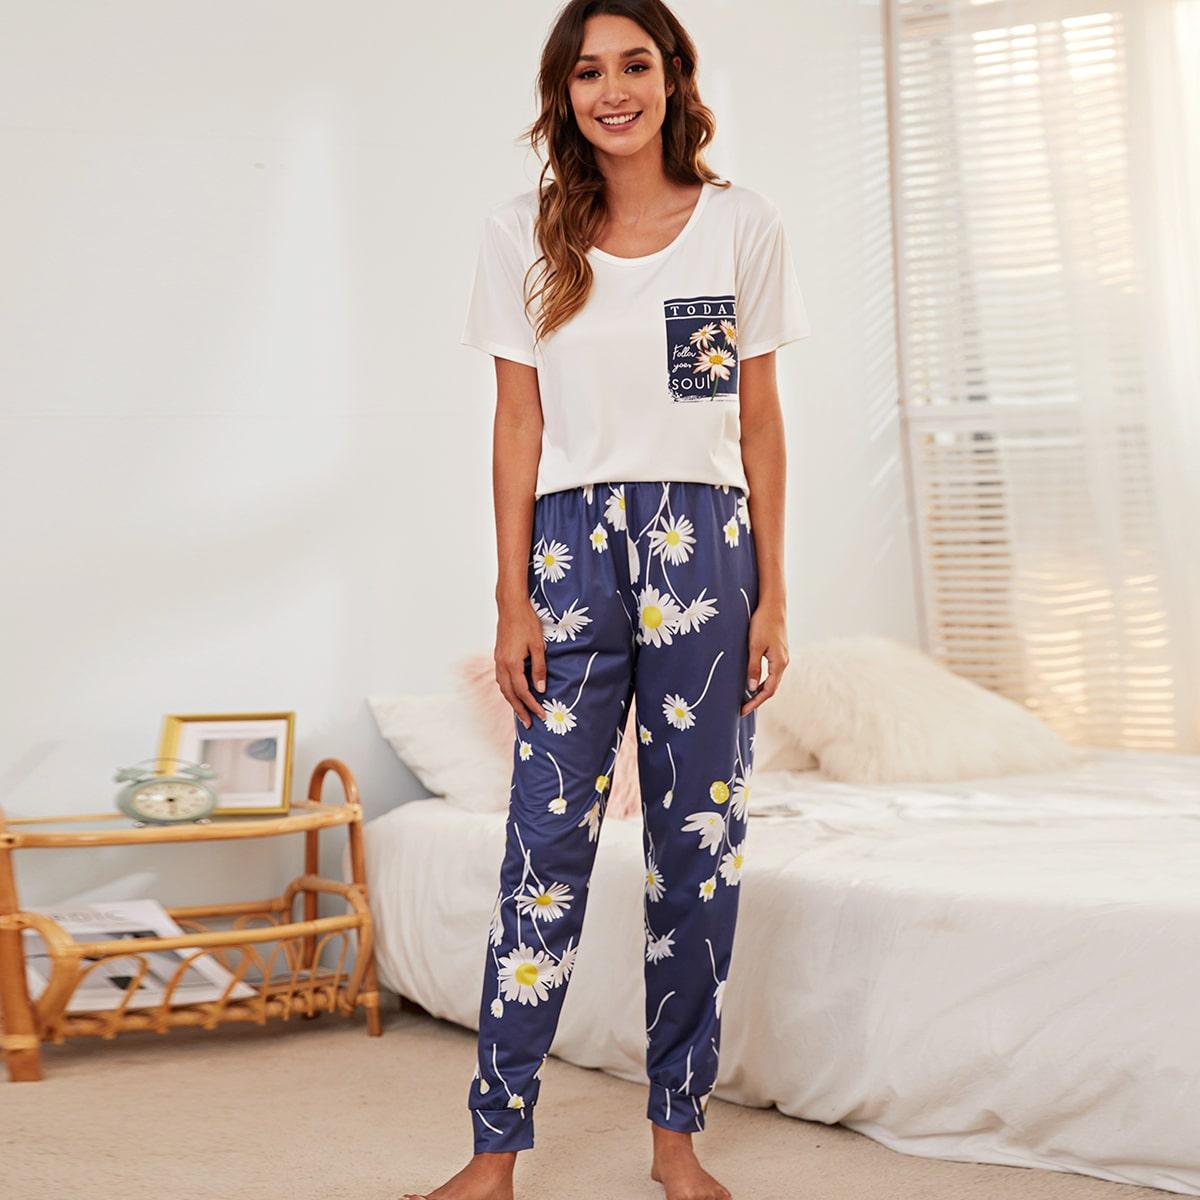 Letter & Floral Print Pajama Set